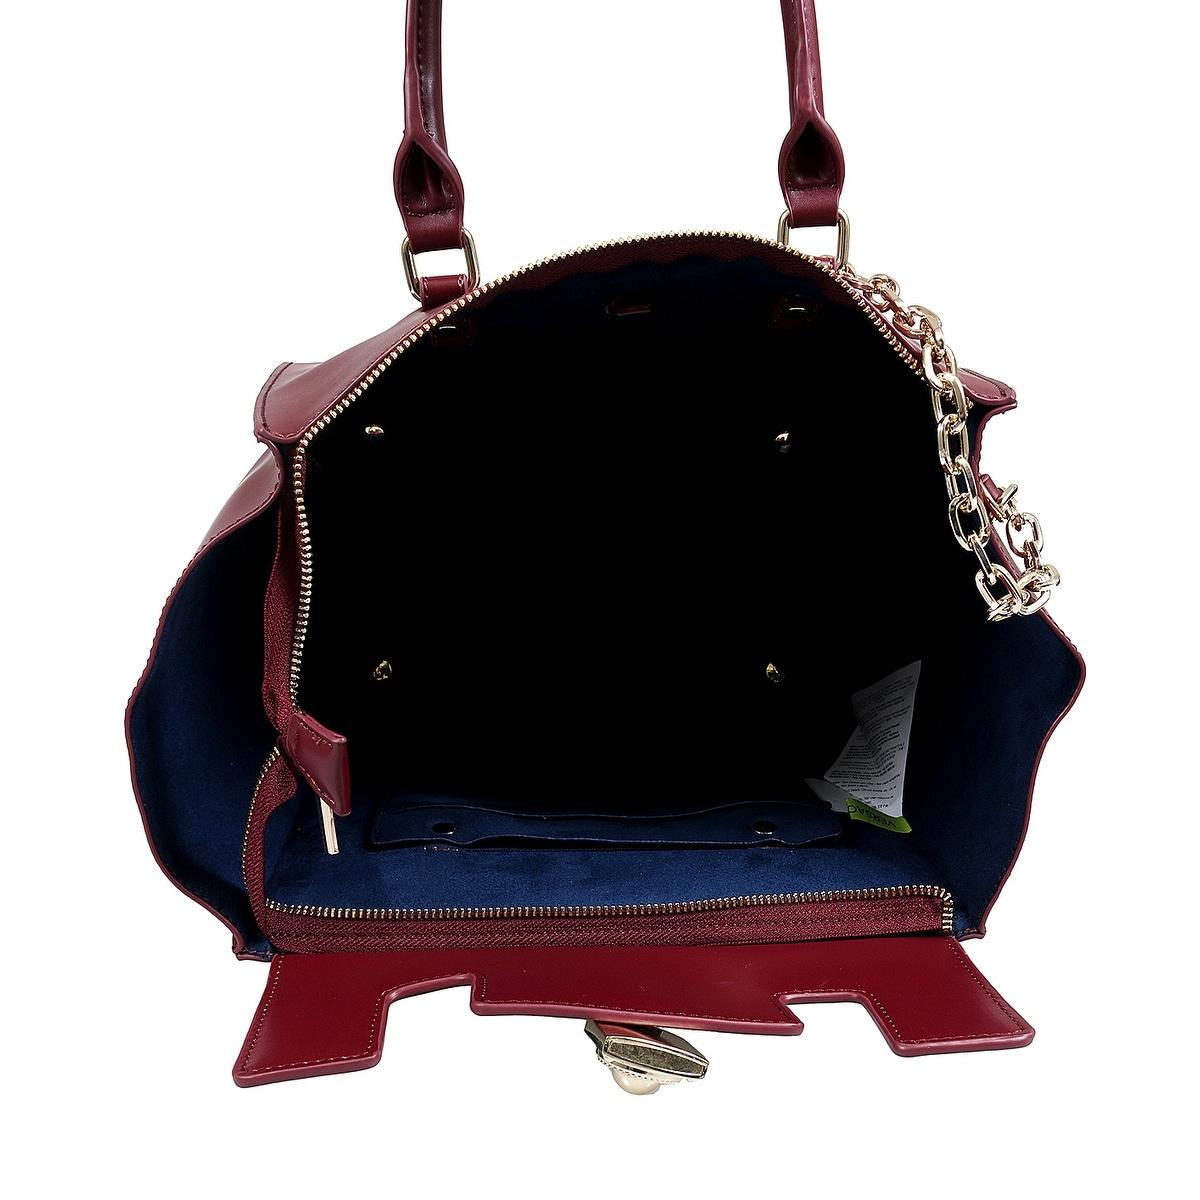 4fe8c04e9d Shop Versace EE1VSBBG6 EJ31 Maroon Satchel Bag - 17-9-7.5 - Free Shipping  Today - Overstock.com - 25601355